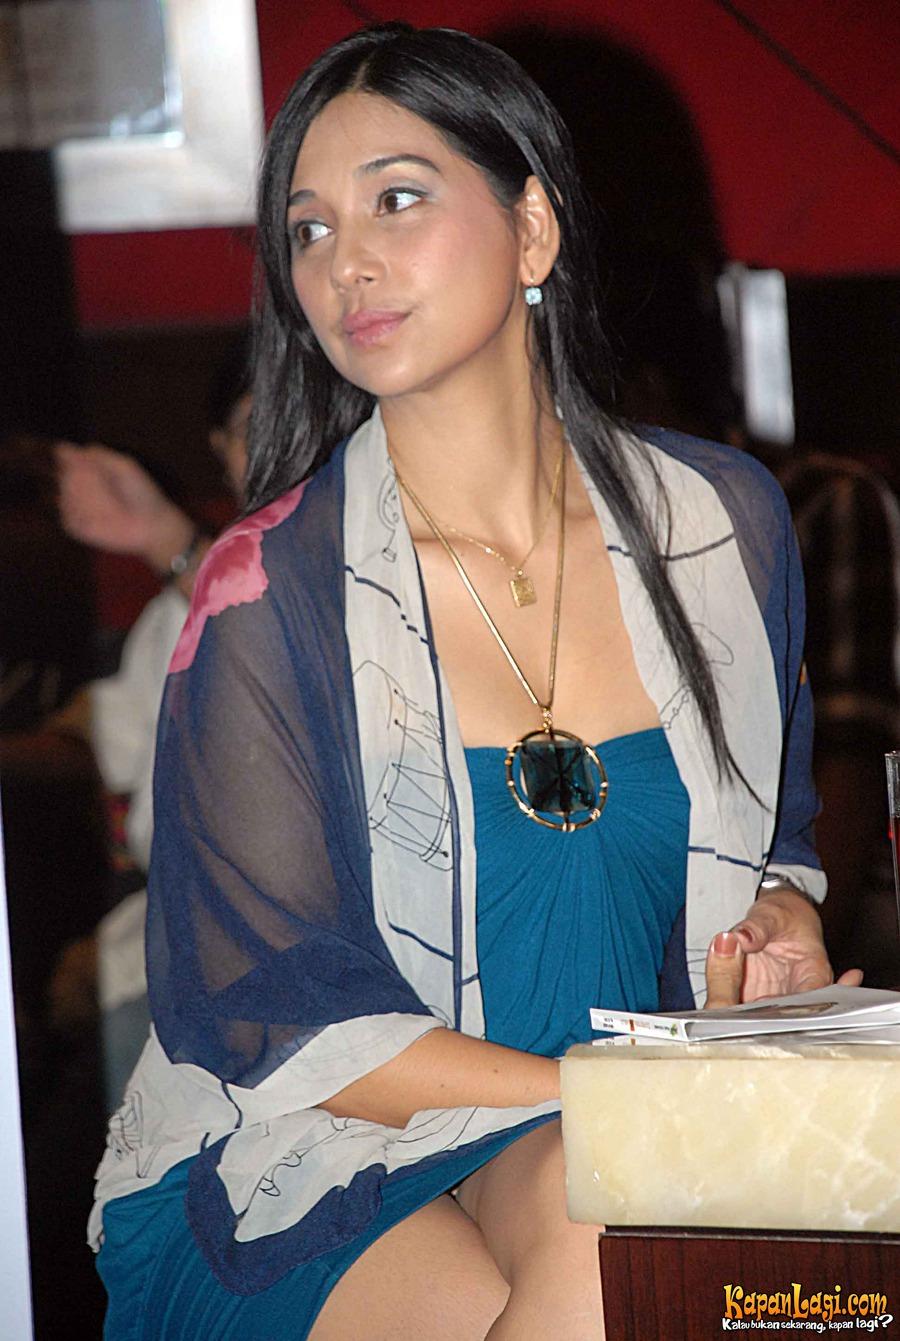 Ayu Azhari - Indonesian Actress